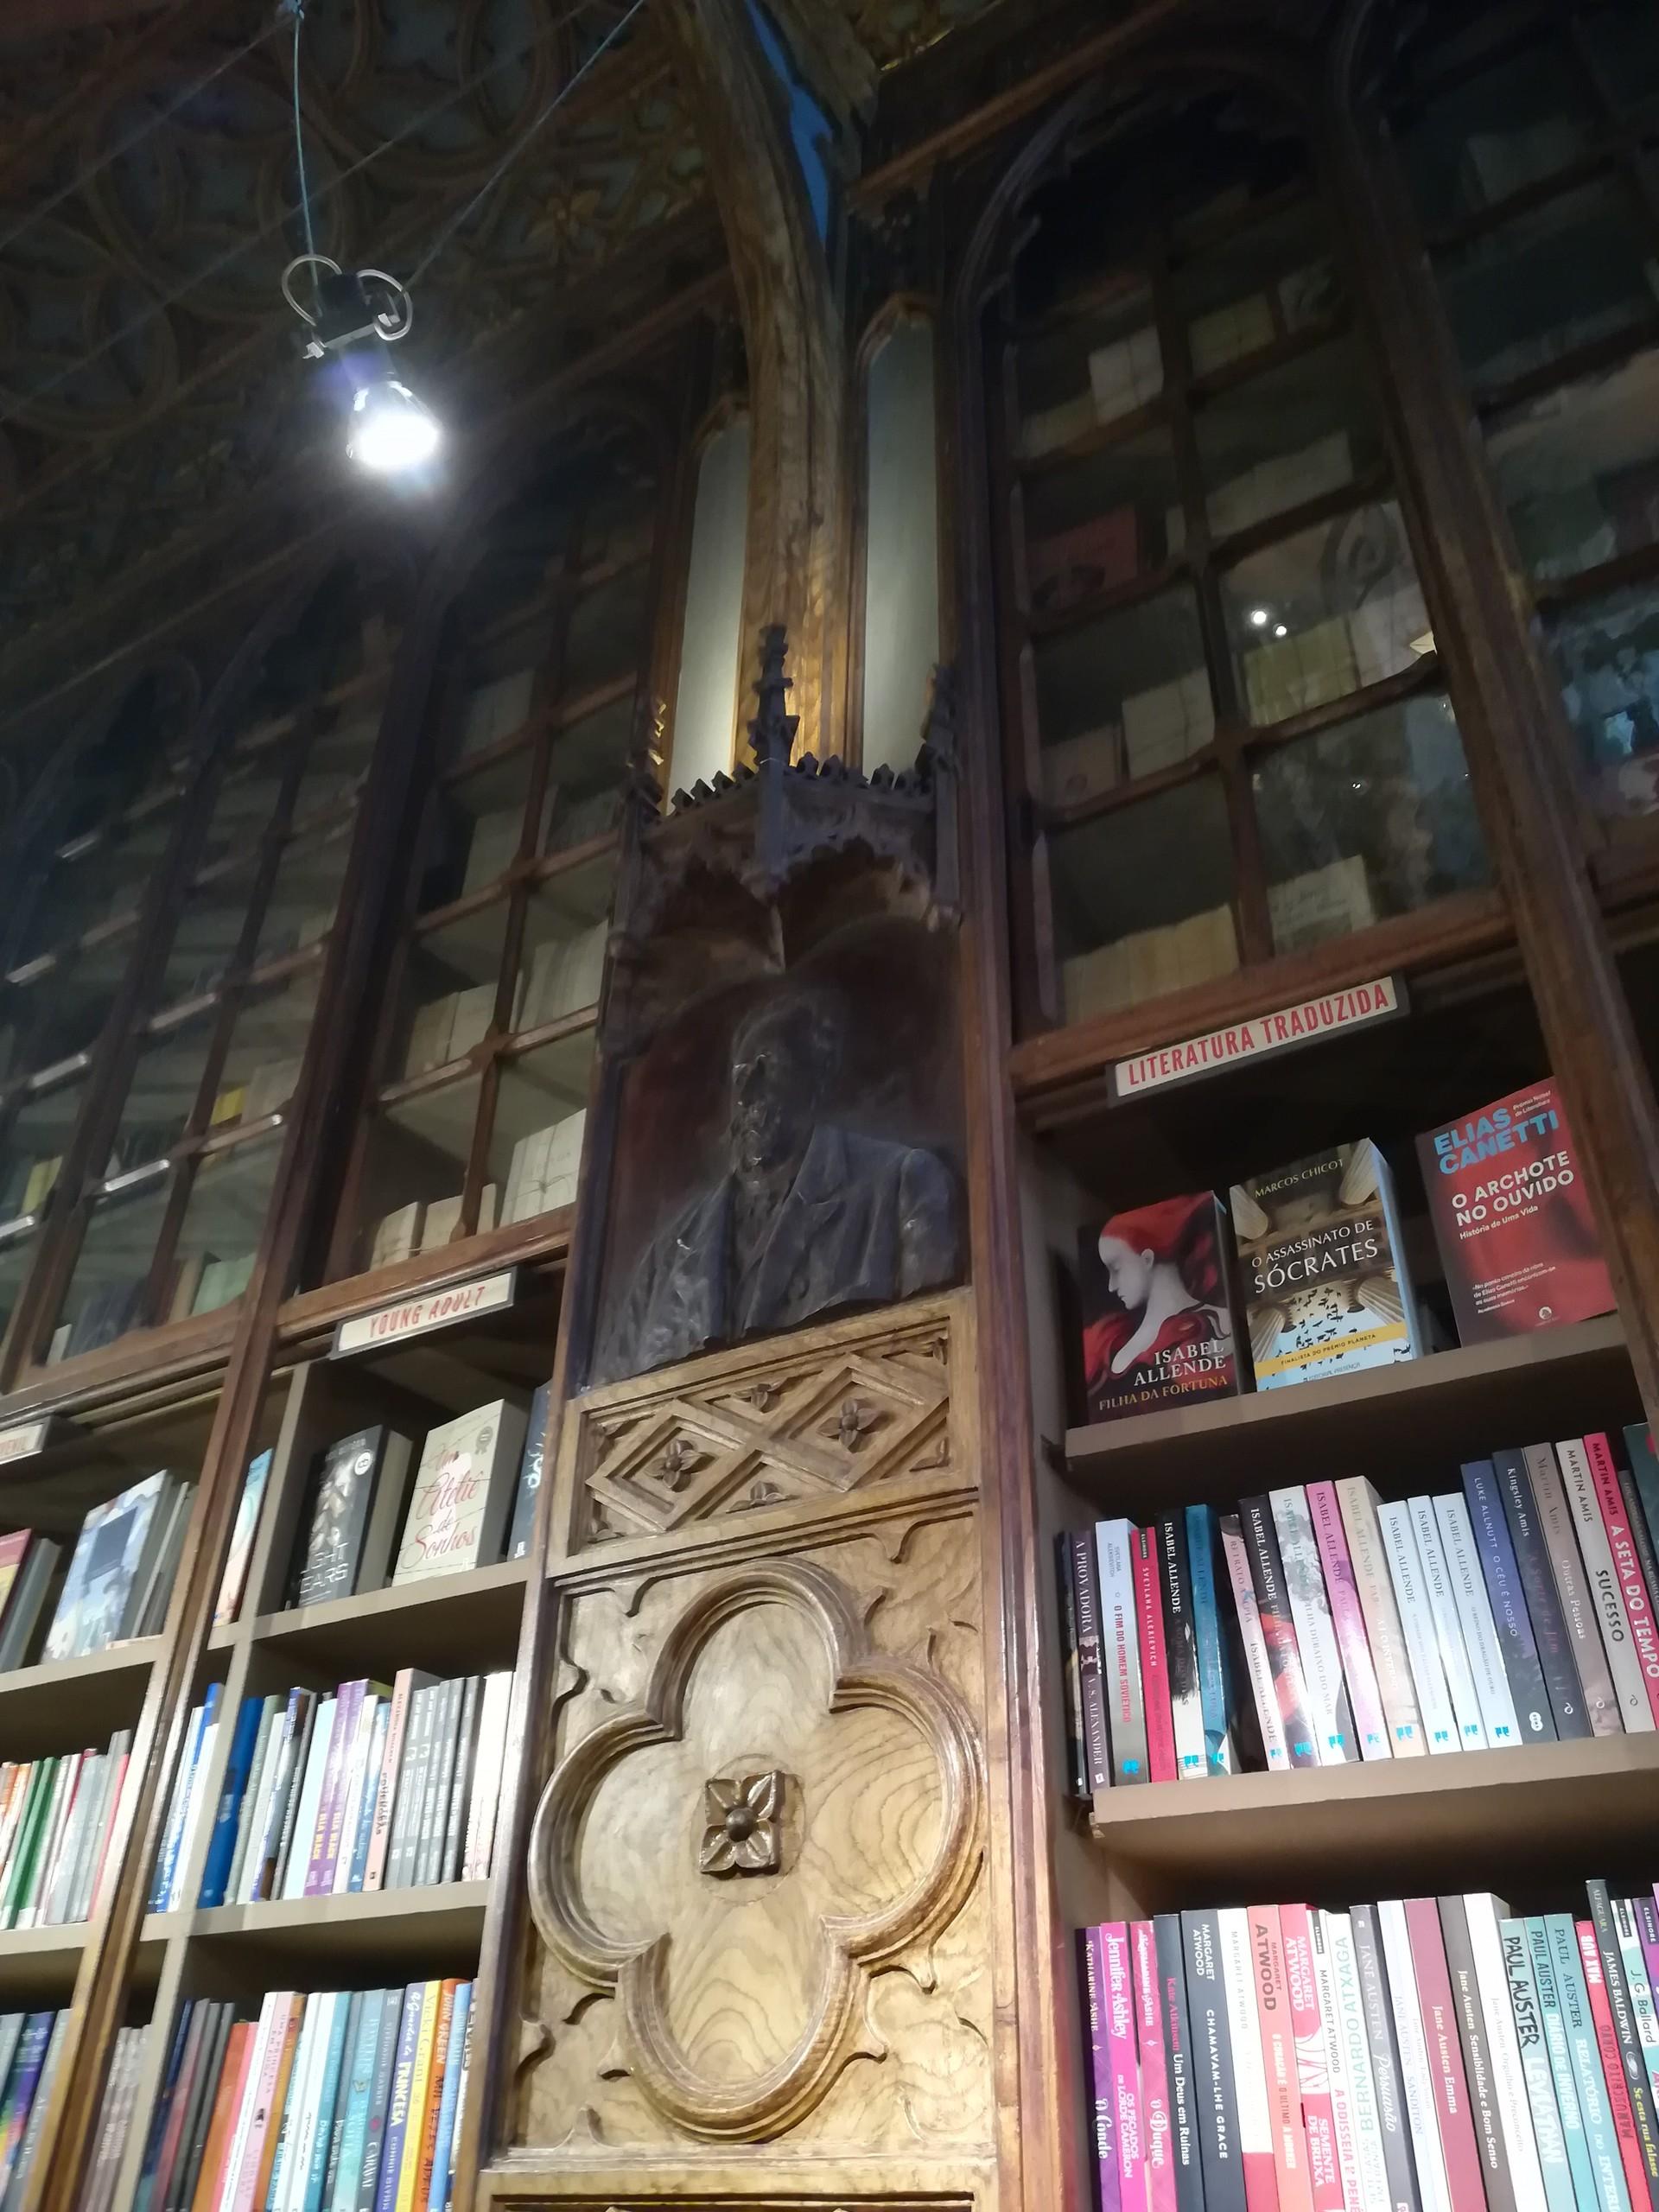 la-librairie-inspire-j-k-rowlings-0e1c4fc8d23d067208cd757527fa244f.jpg